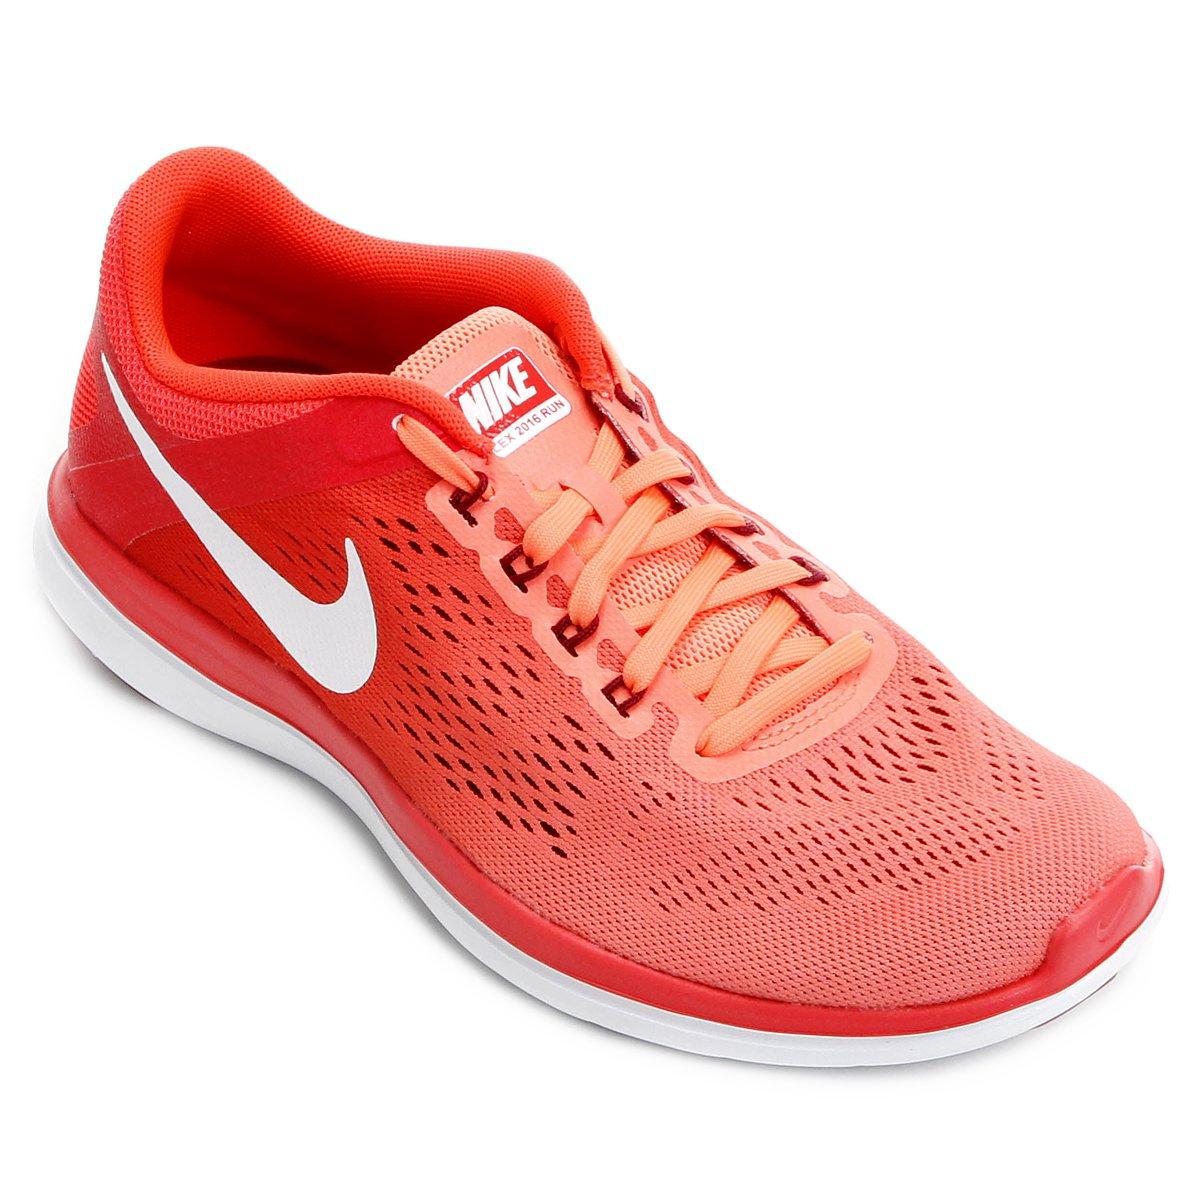 promo code 9cb99 80ef7 Tênis Nike Flex 2016 RN Feminino | Loja do Inter